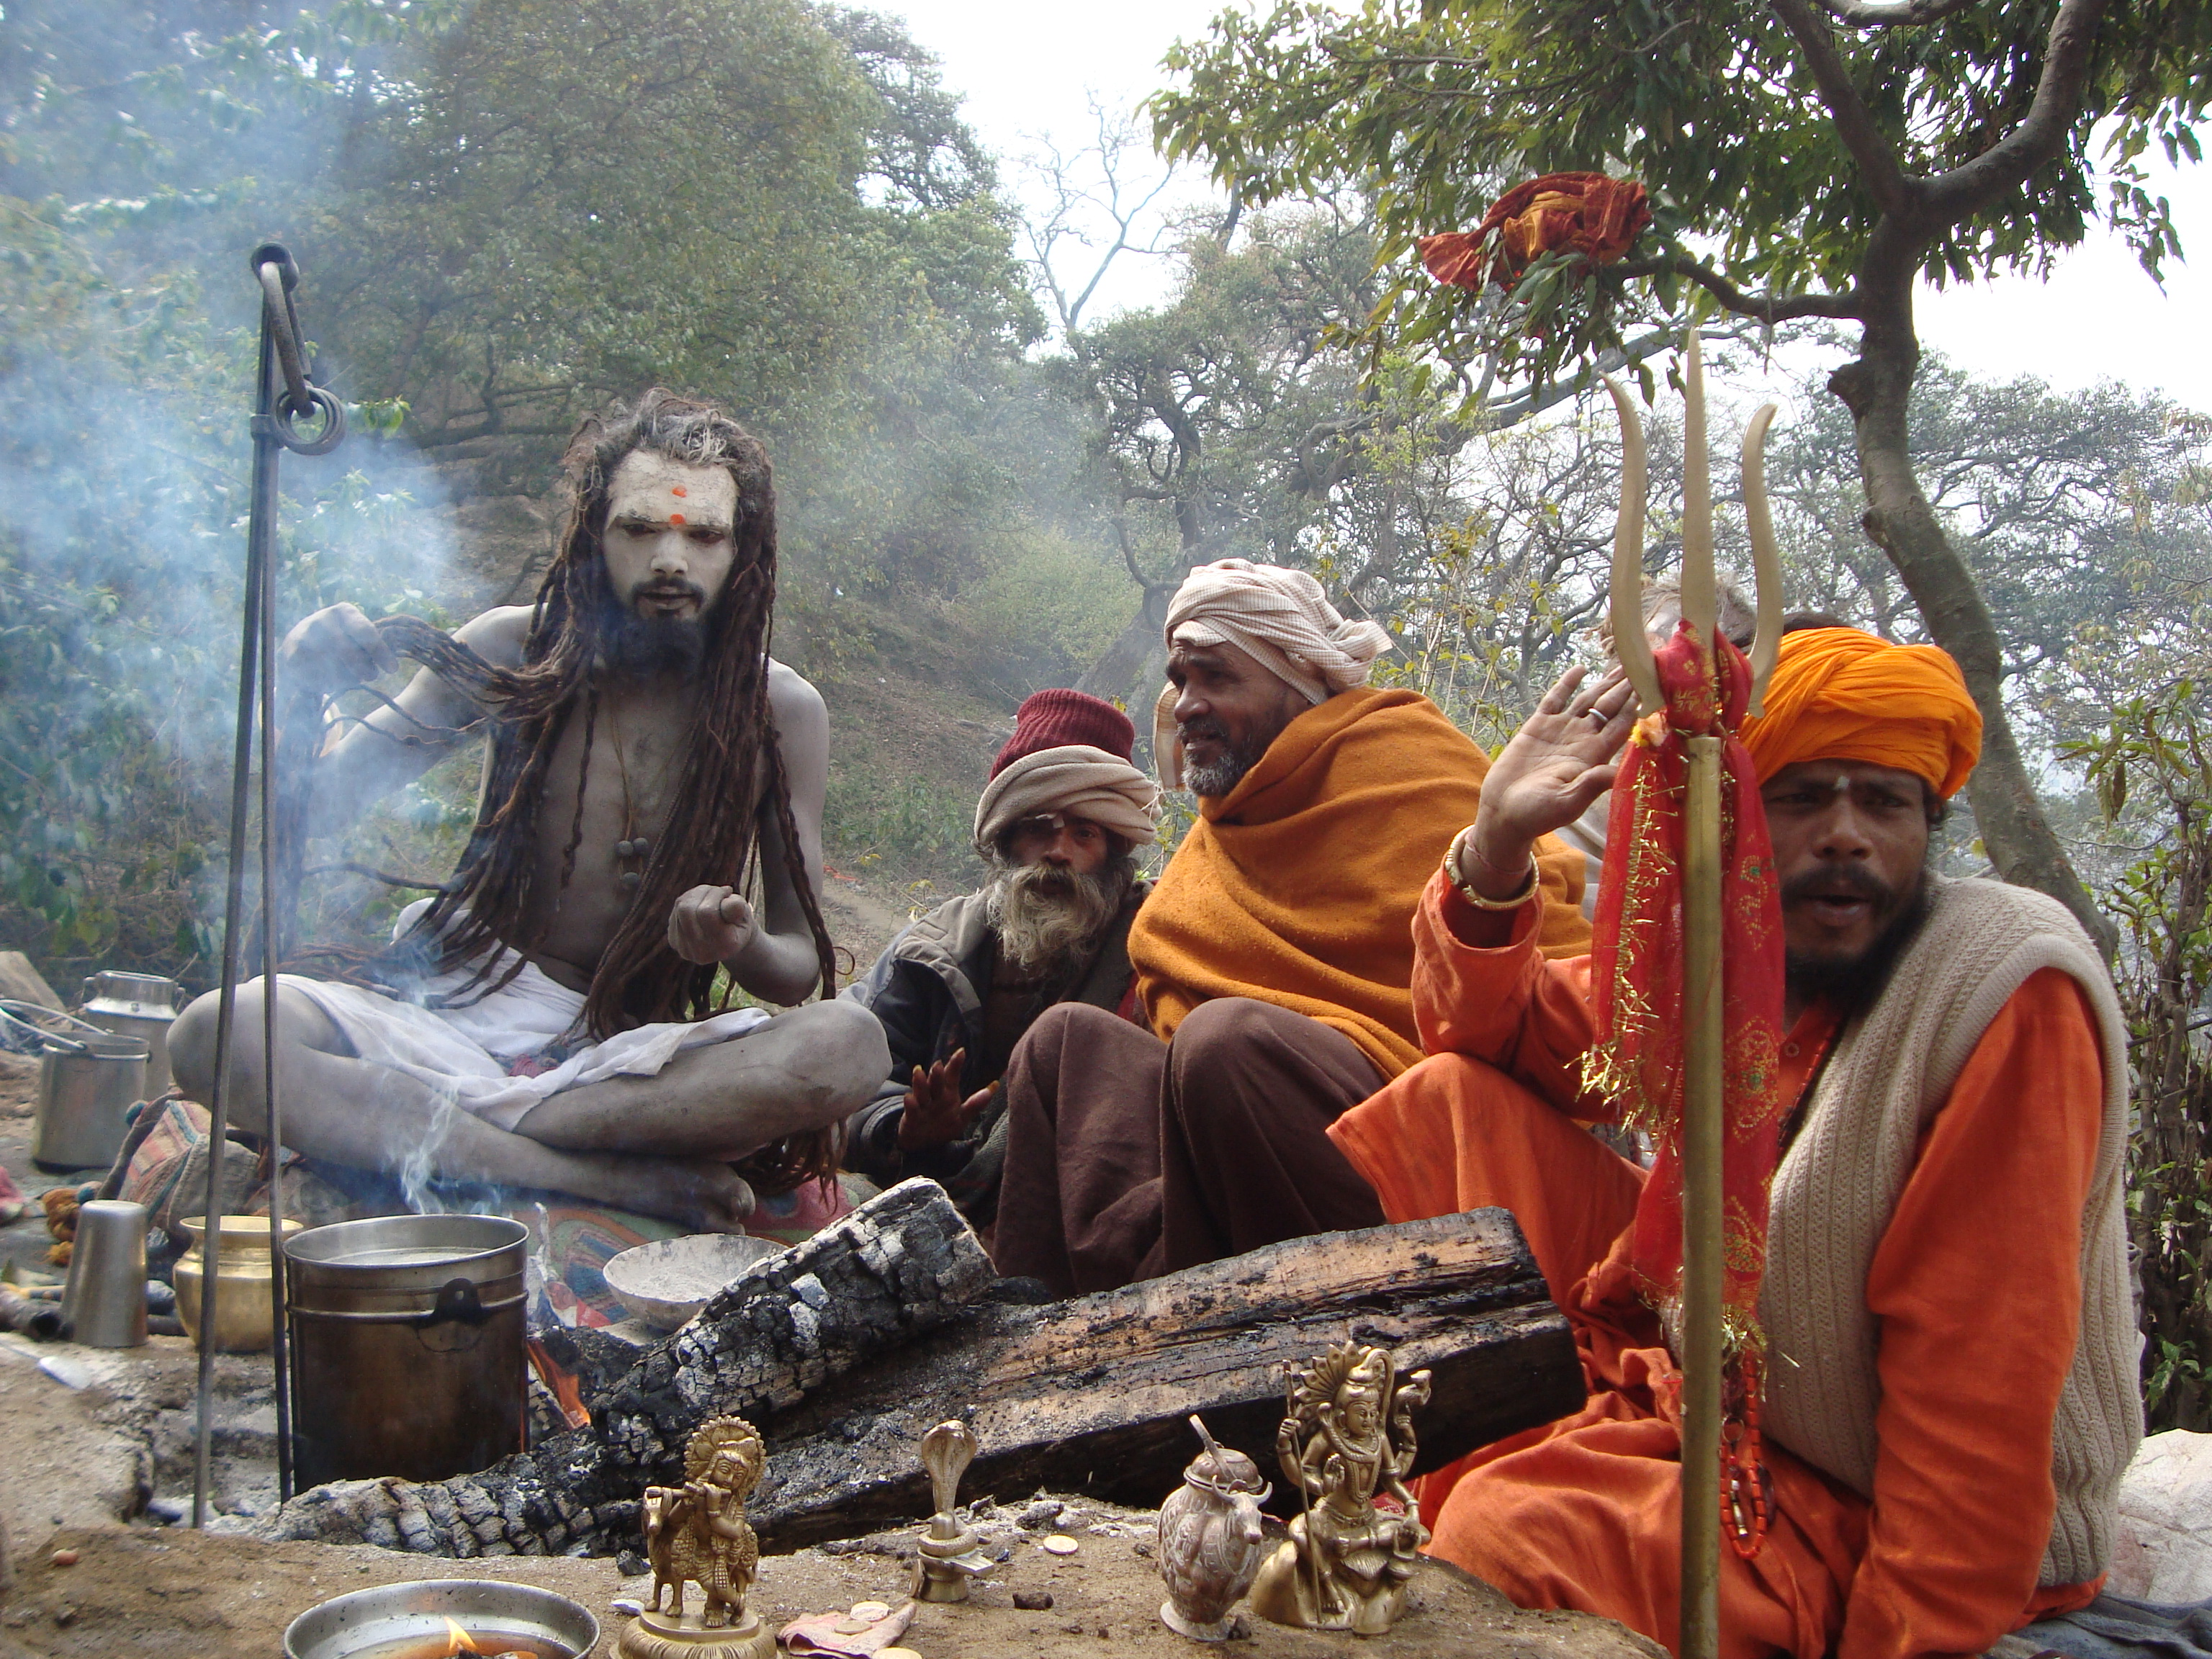 Maha Shivaratri 2017: Stunning images show holy men